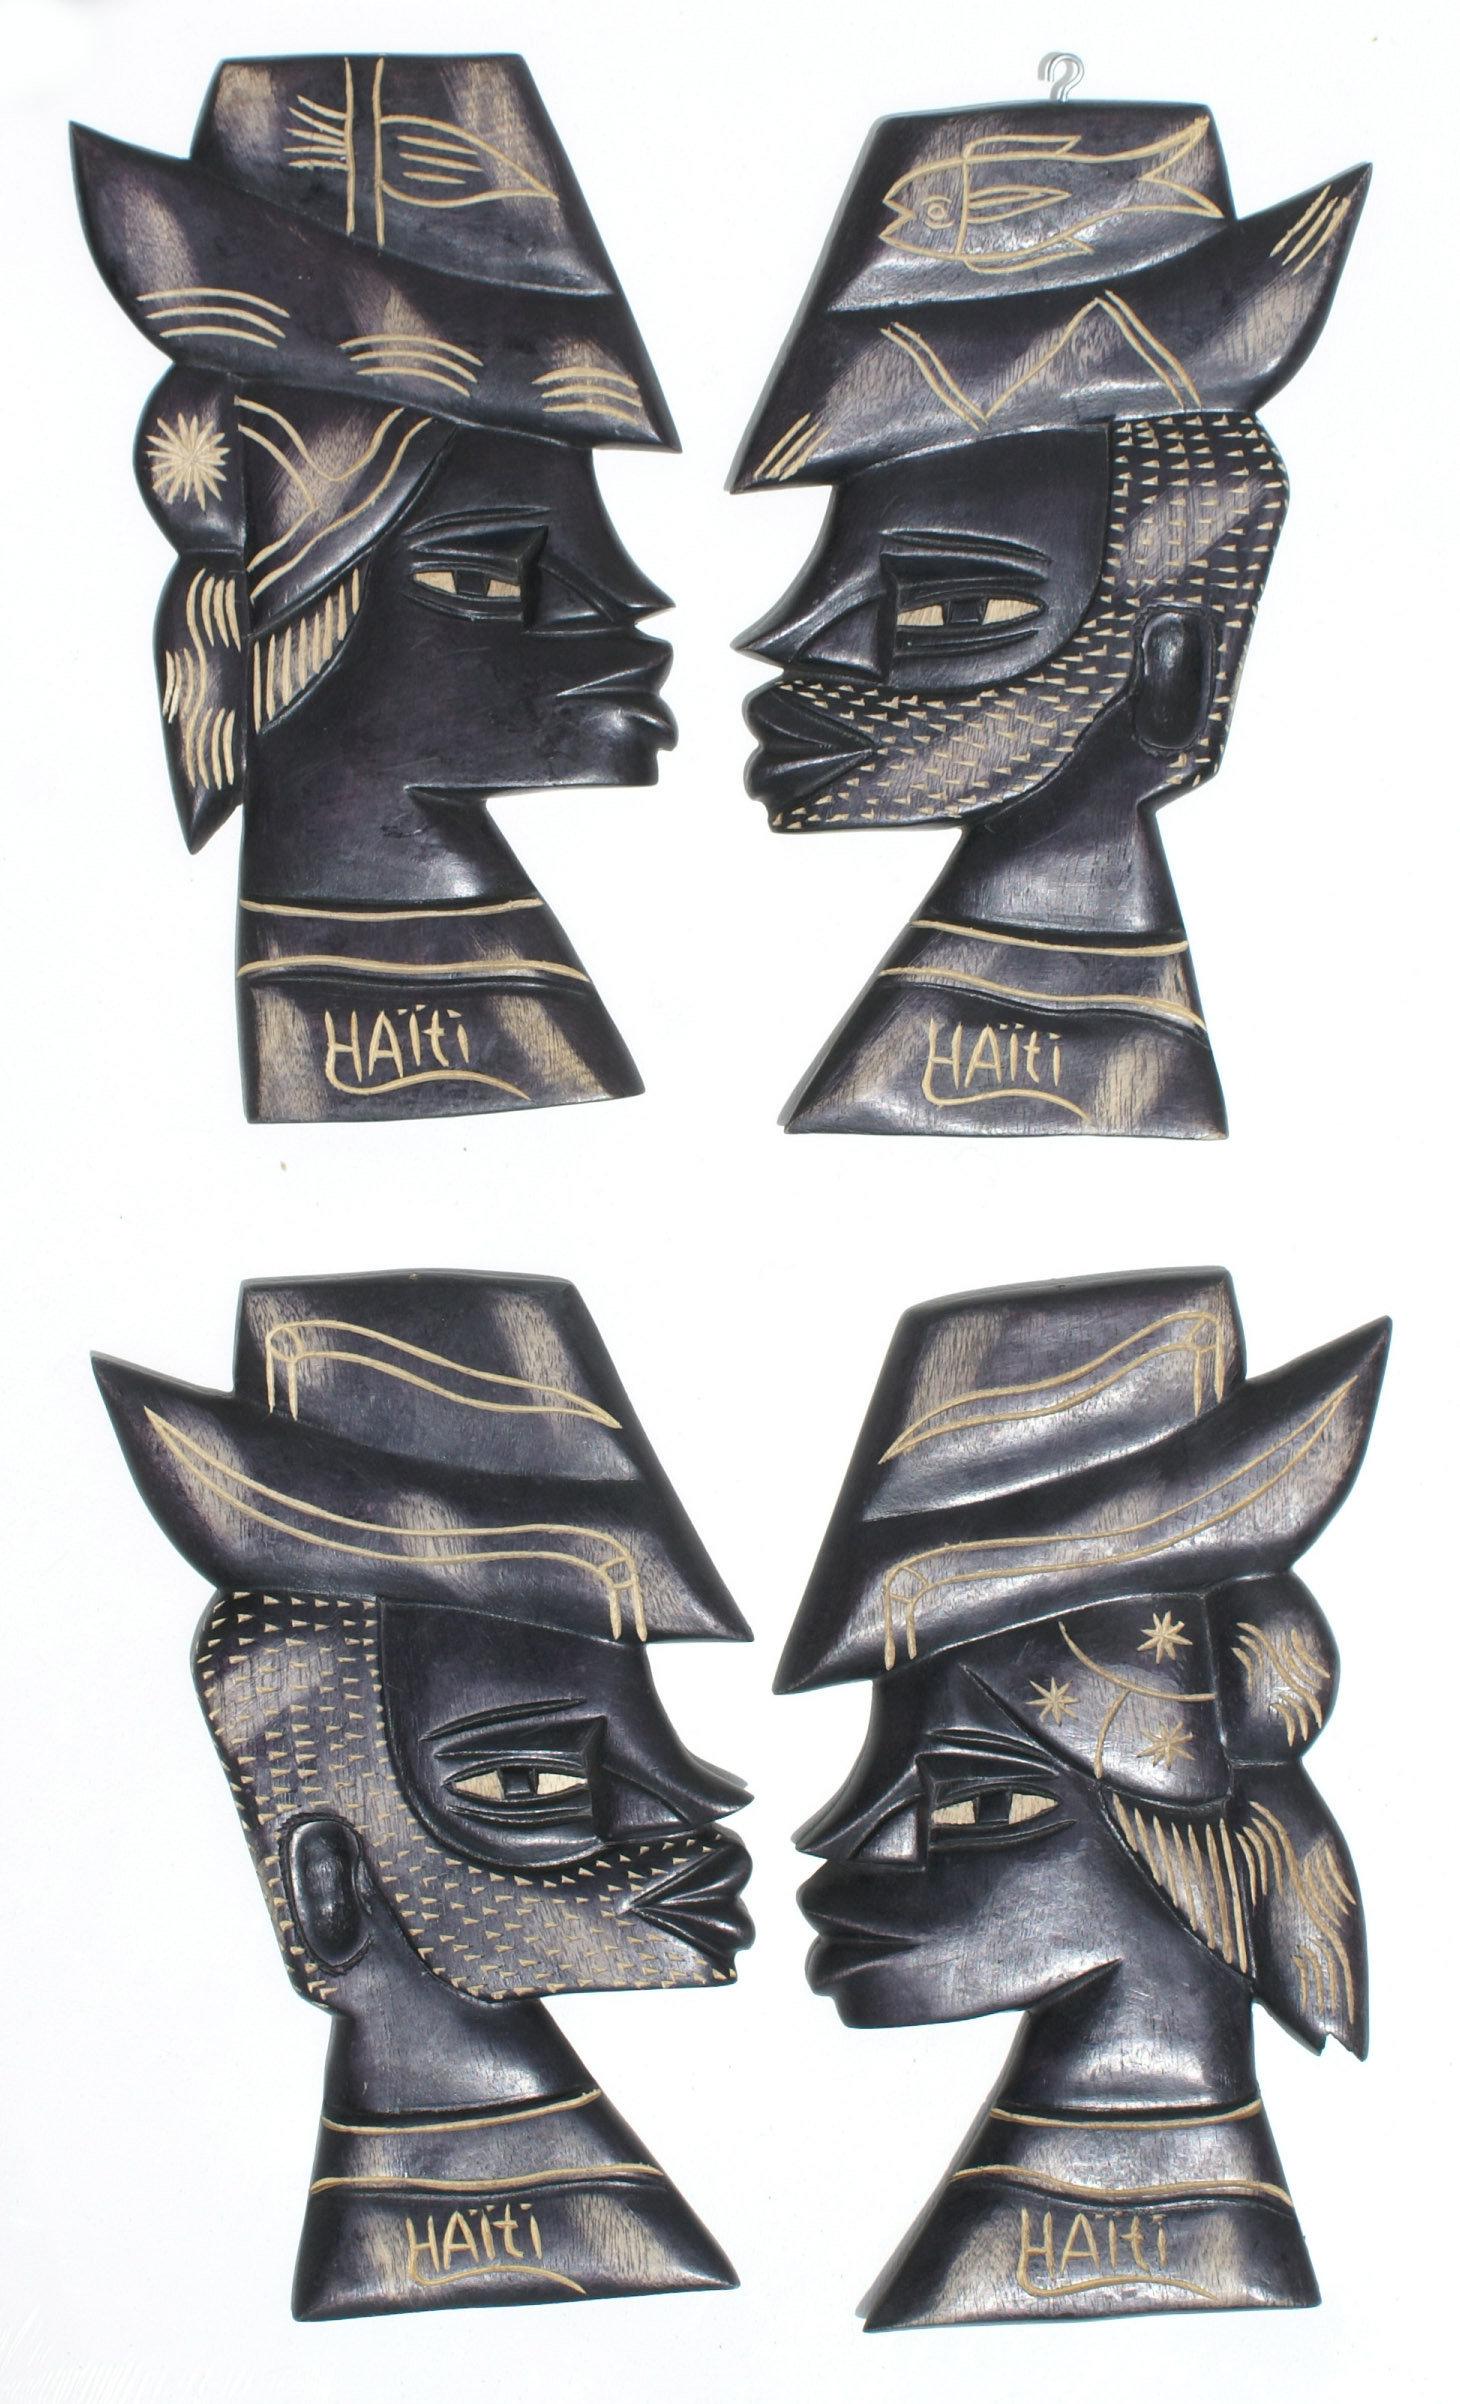 Lot 4 Zwarte Maskers Muur Decor Twee Paar Man En Vrouw 43 00 Eur Veiling Nederland